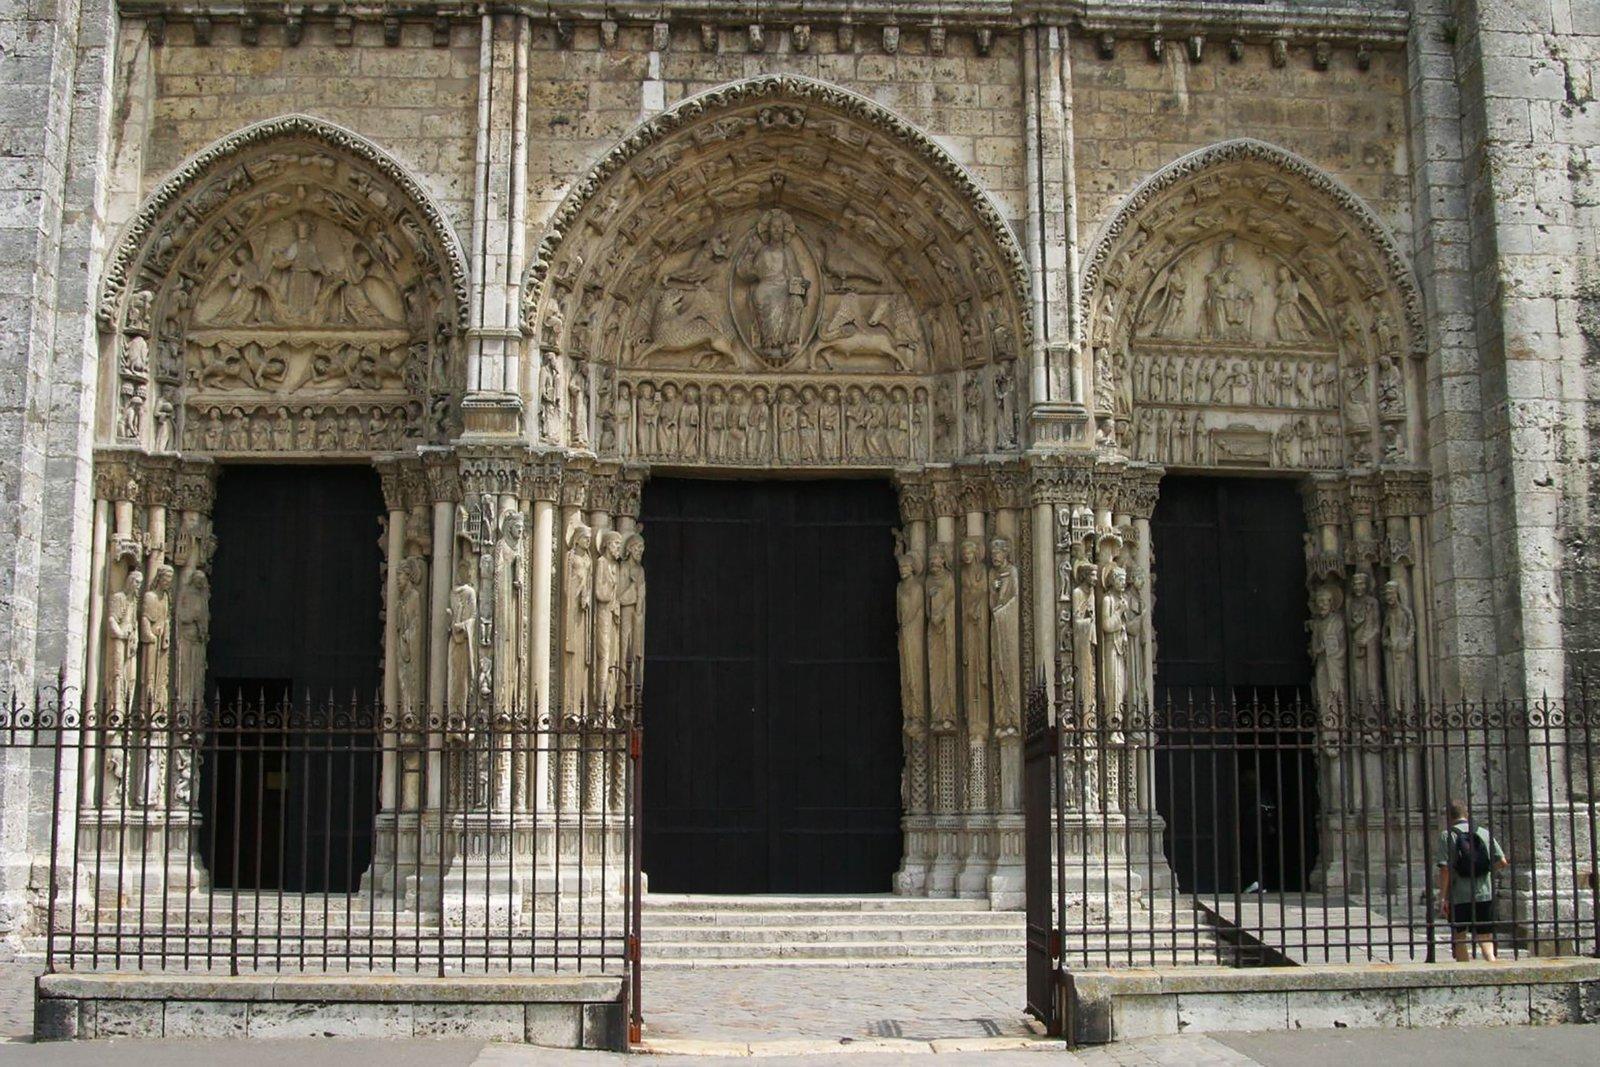 Katedra wChartres, Portal Królewski Katedra wChartres, Portal Królewski Źródło: Nina Aldin Thune, licencja: CC BY-SA 3.0.